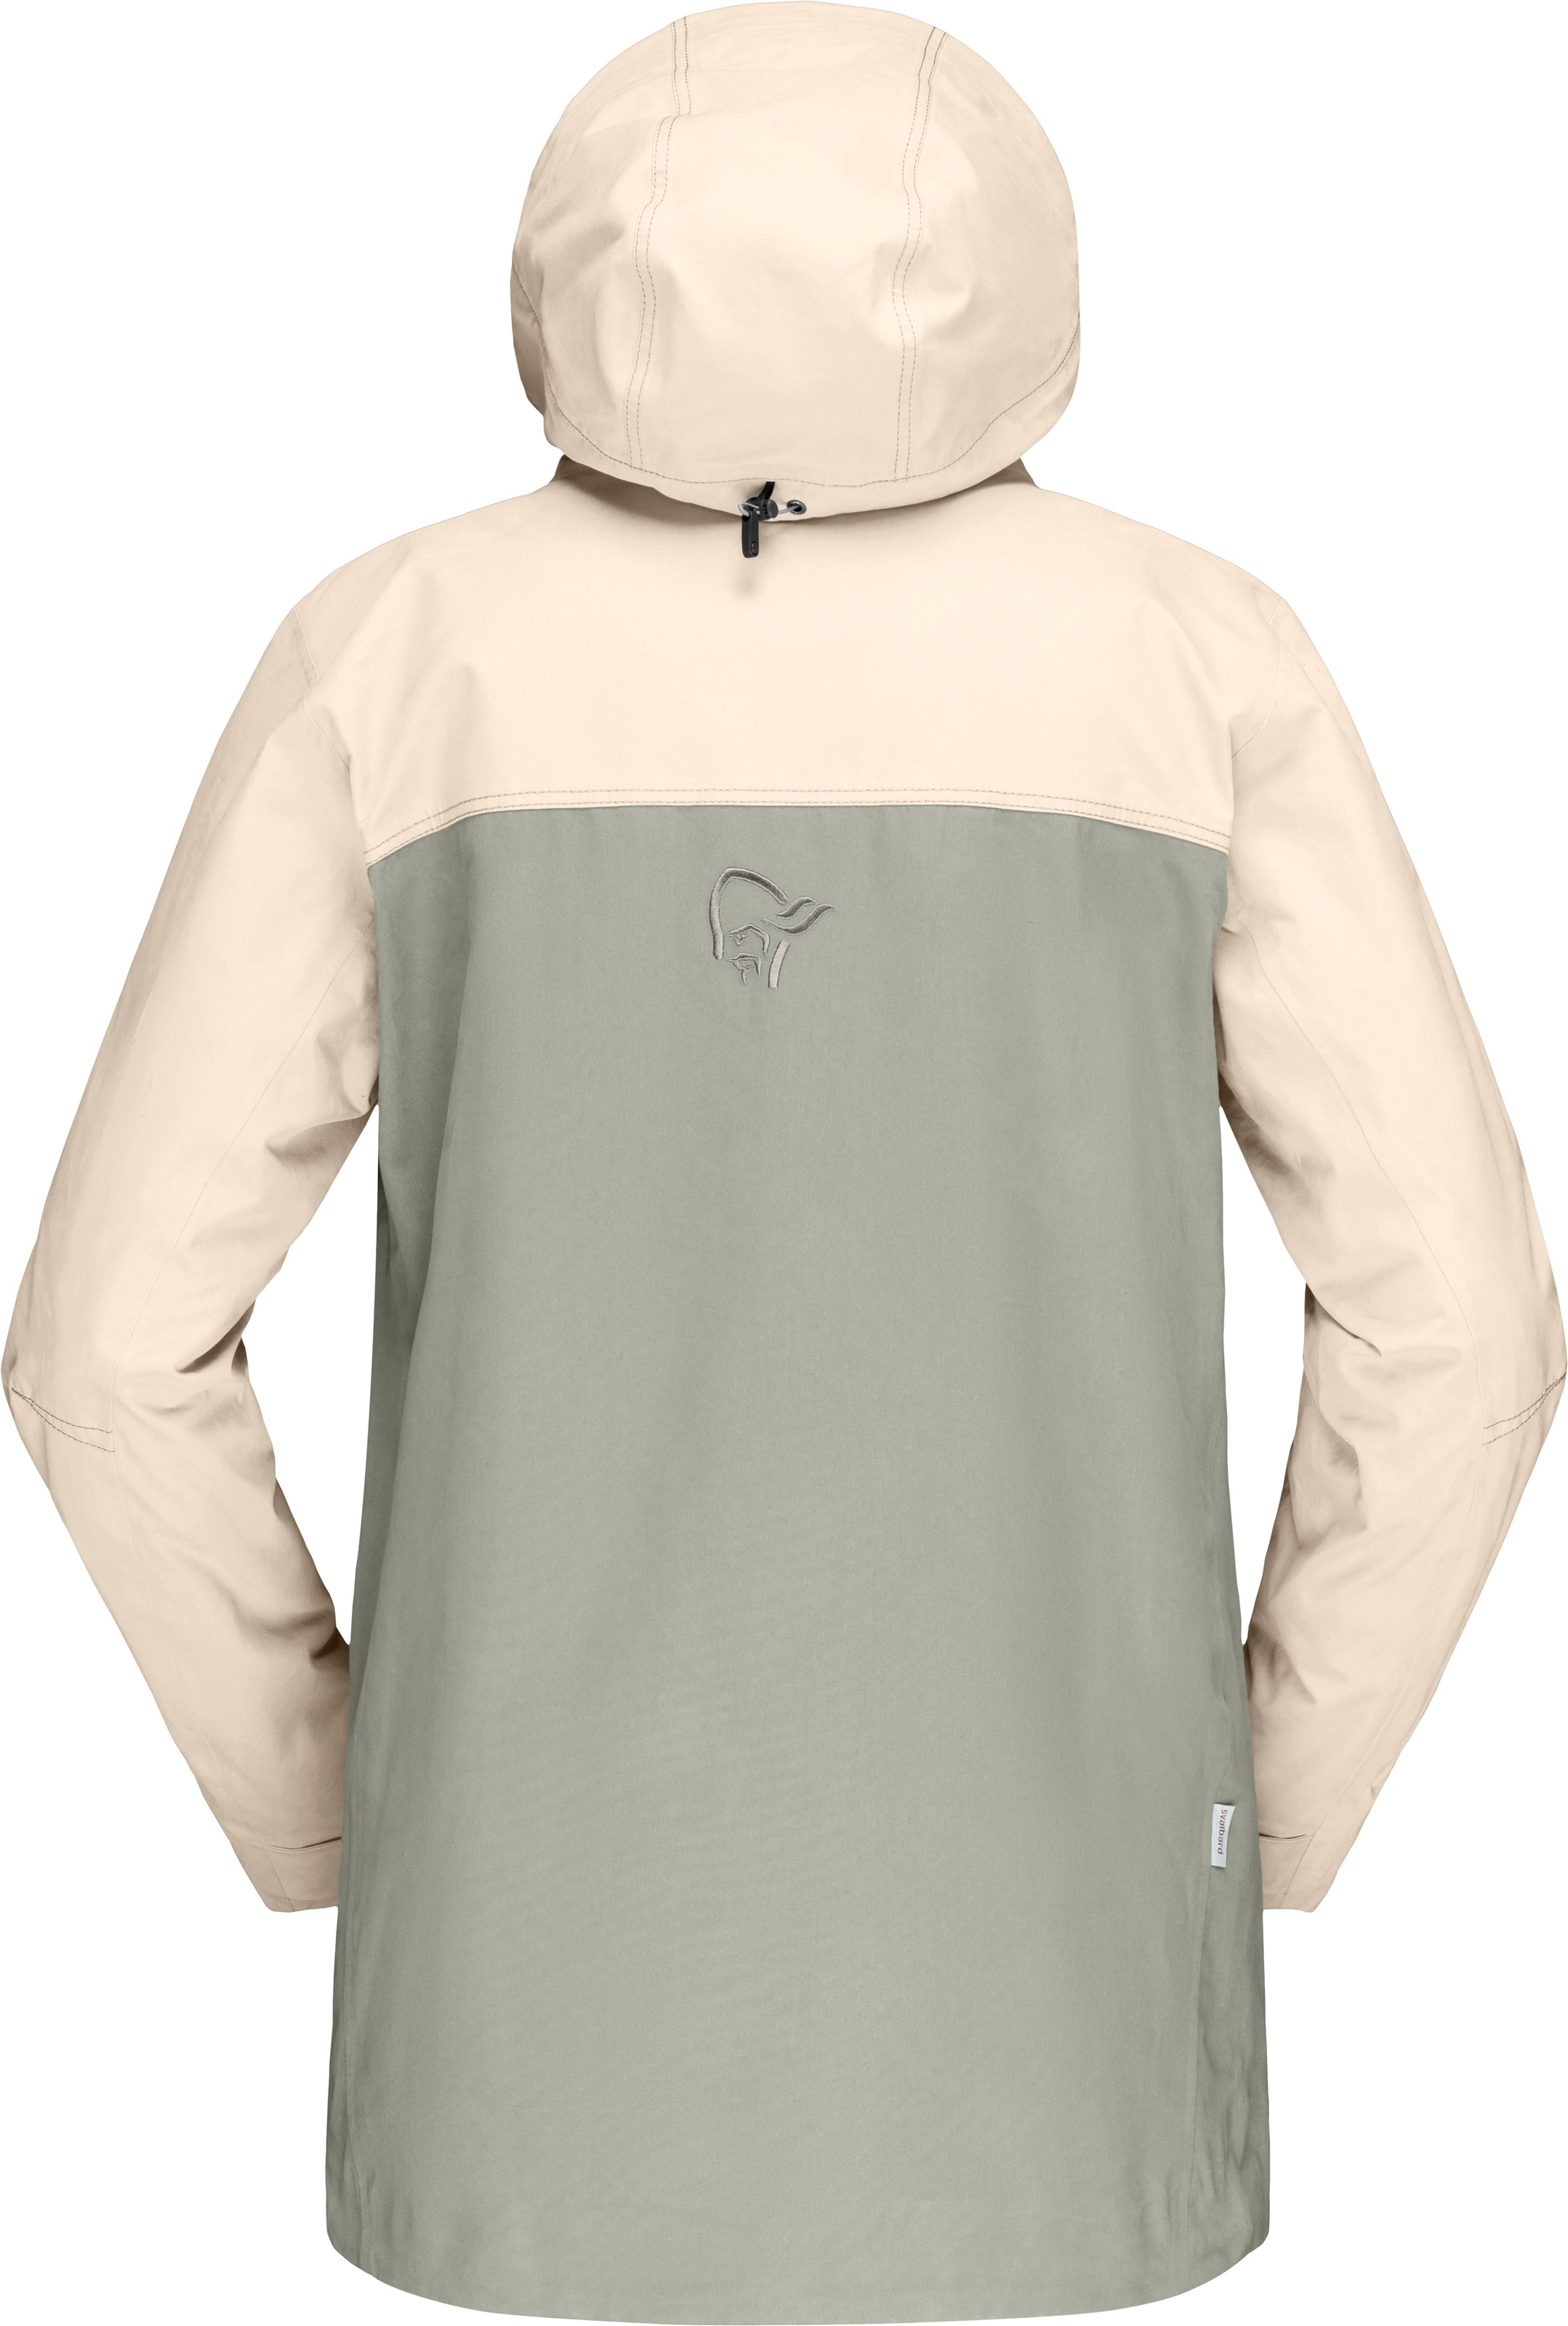 Braasport Norrøna Svalbard Cotton Jacket, bomullsjakke dame